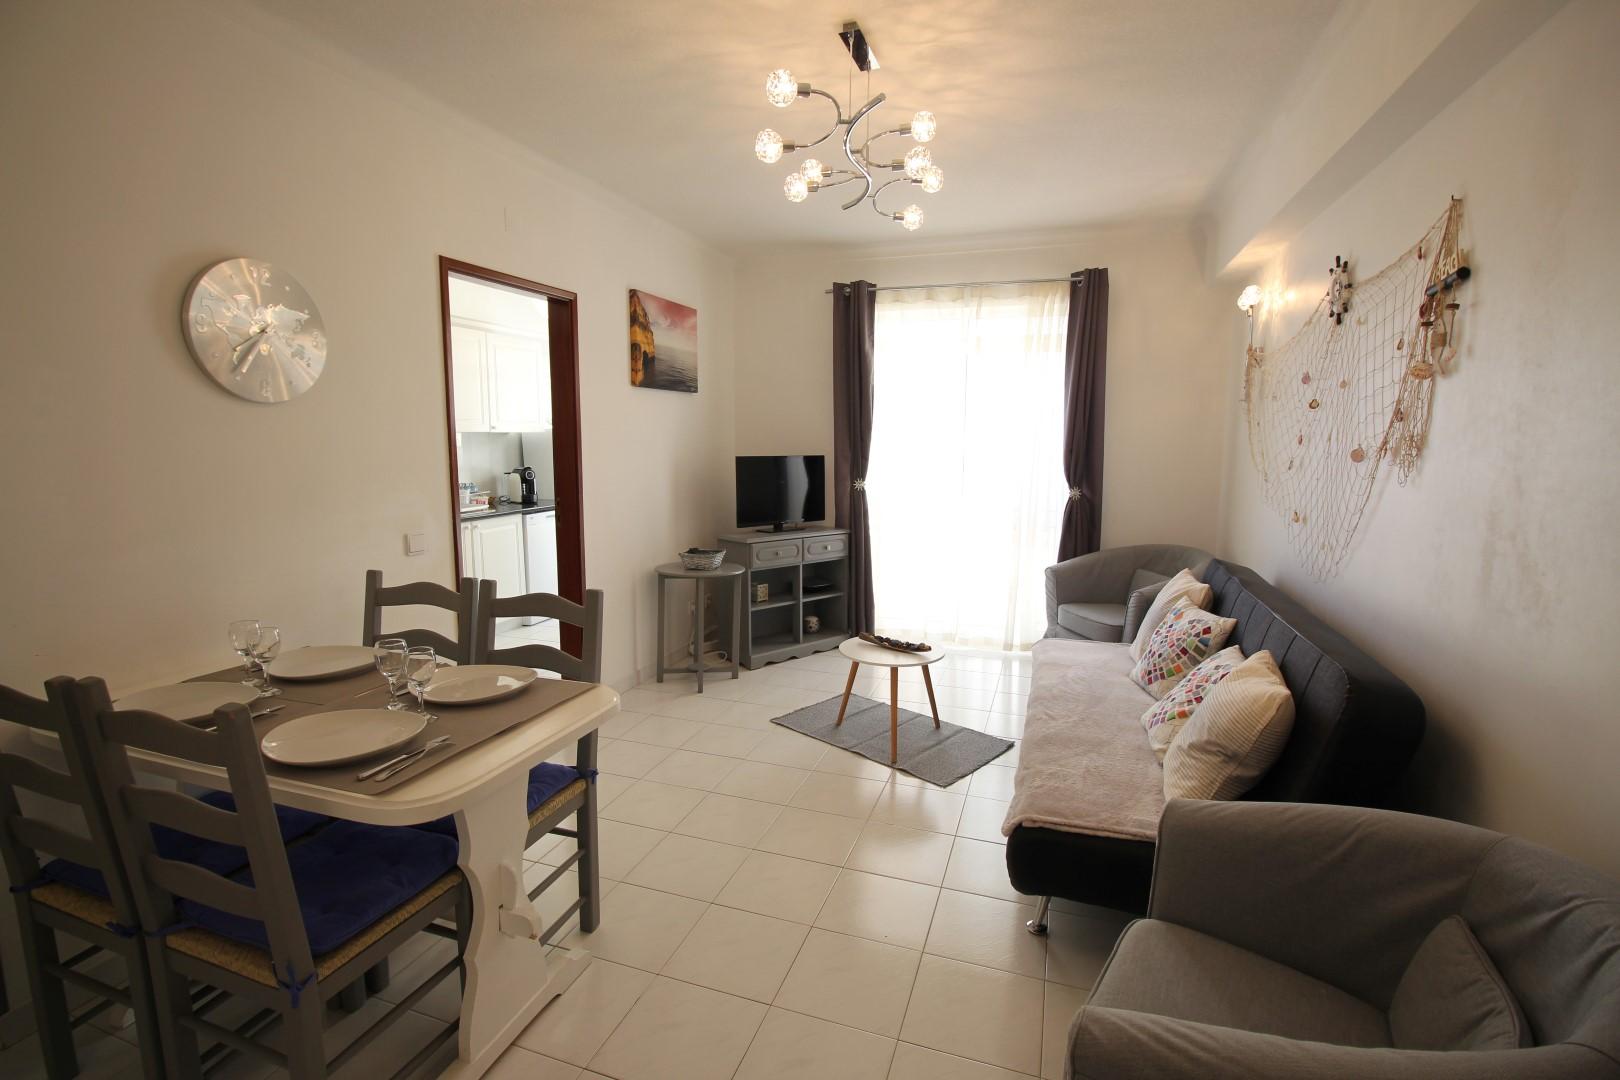 Location appartements et villas de vacance, Appartement en face de la plage – Armação-de-Pêra à Armação de Pêra, Portugal Algarve, REF_IMG_6809_8740